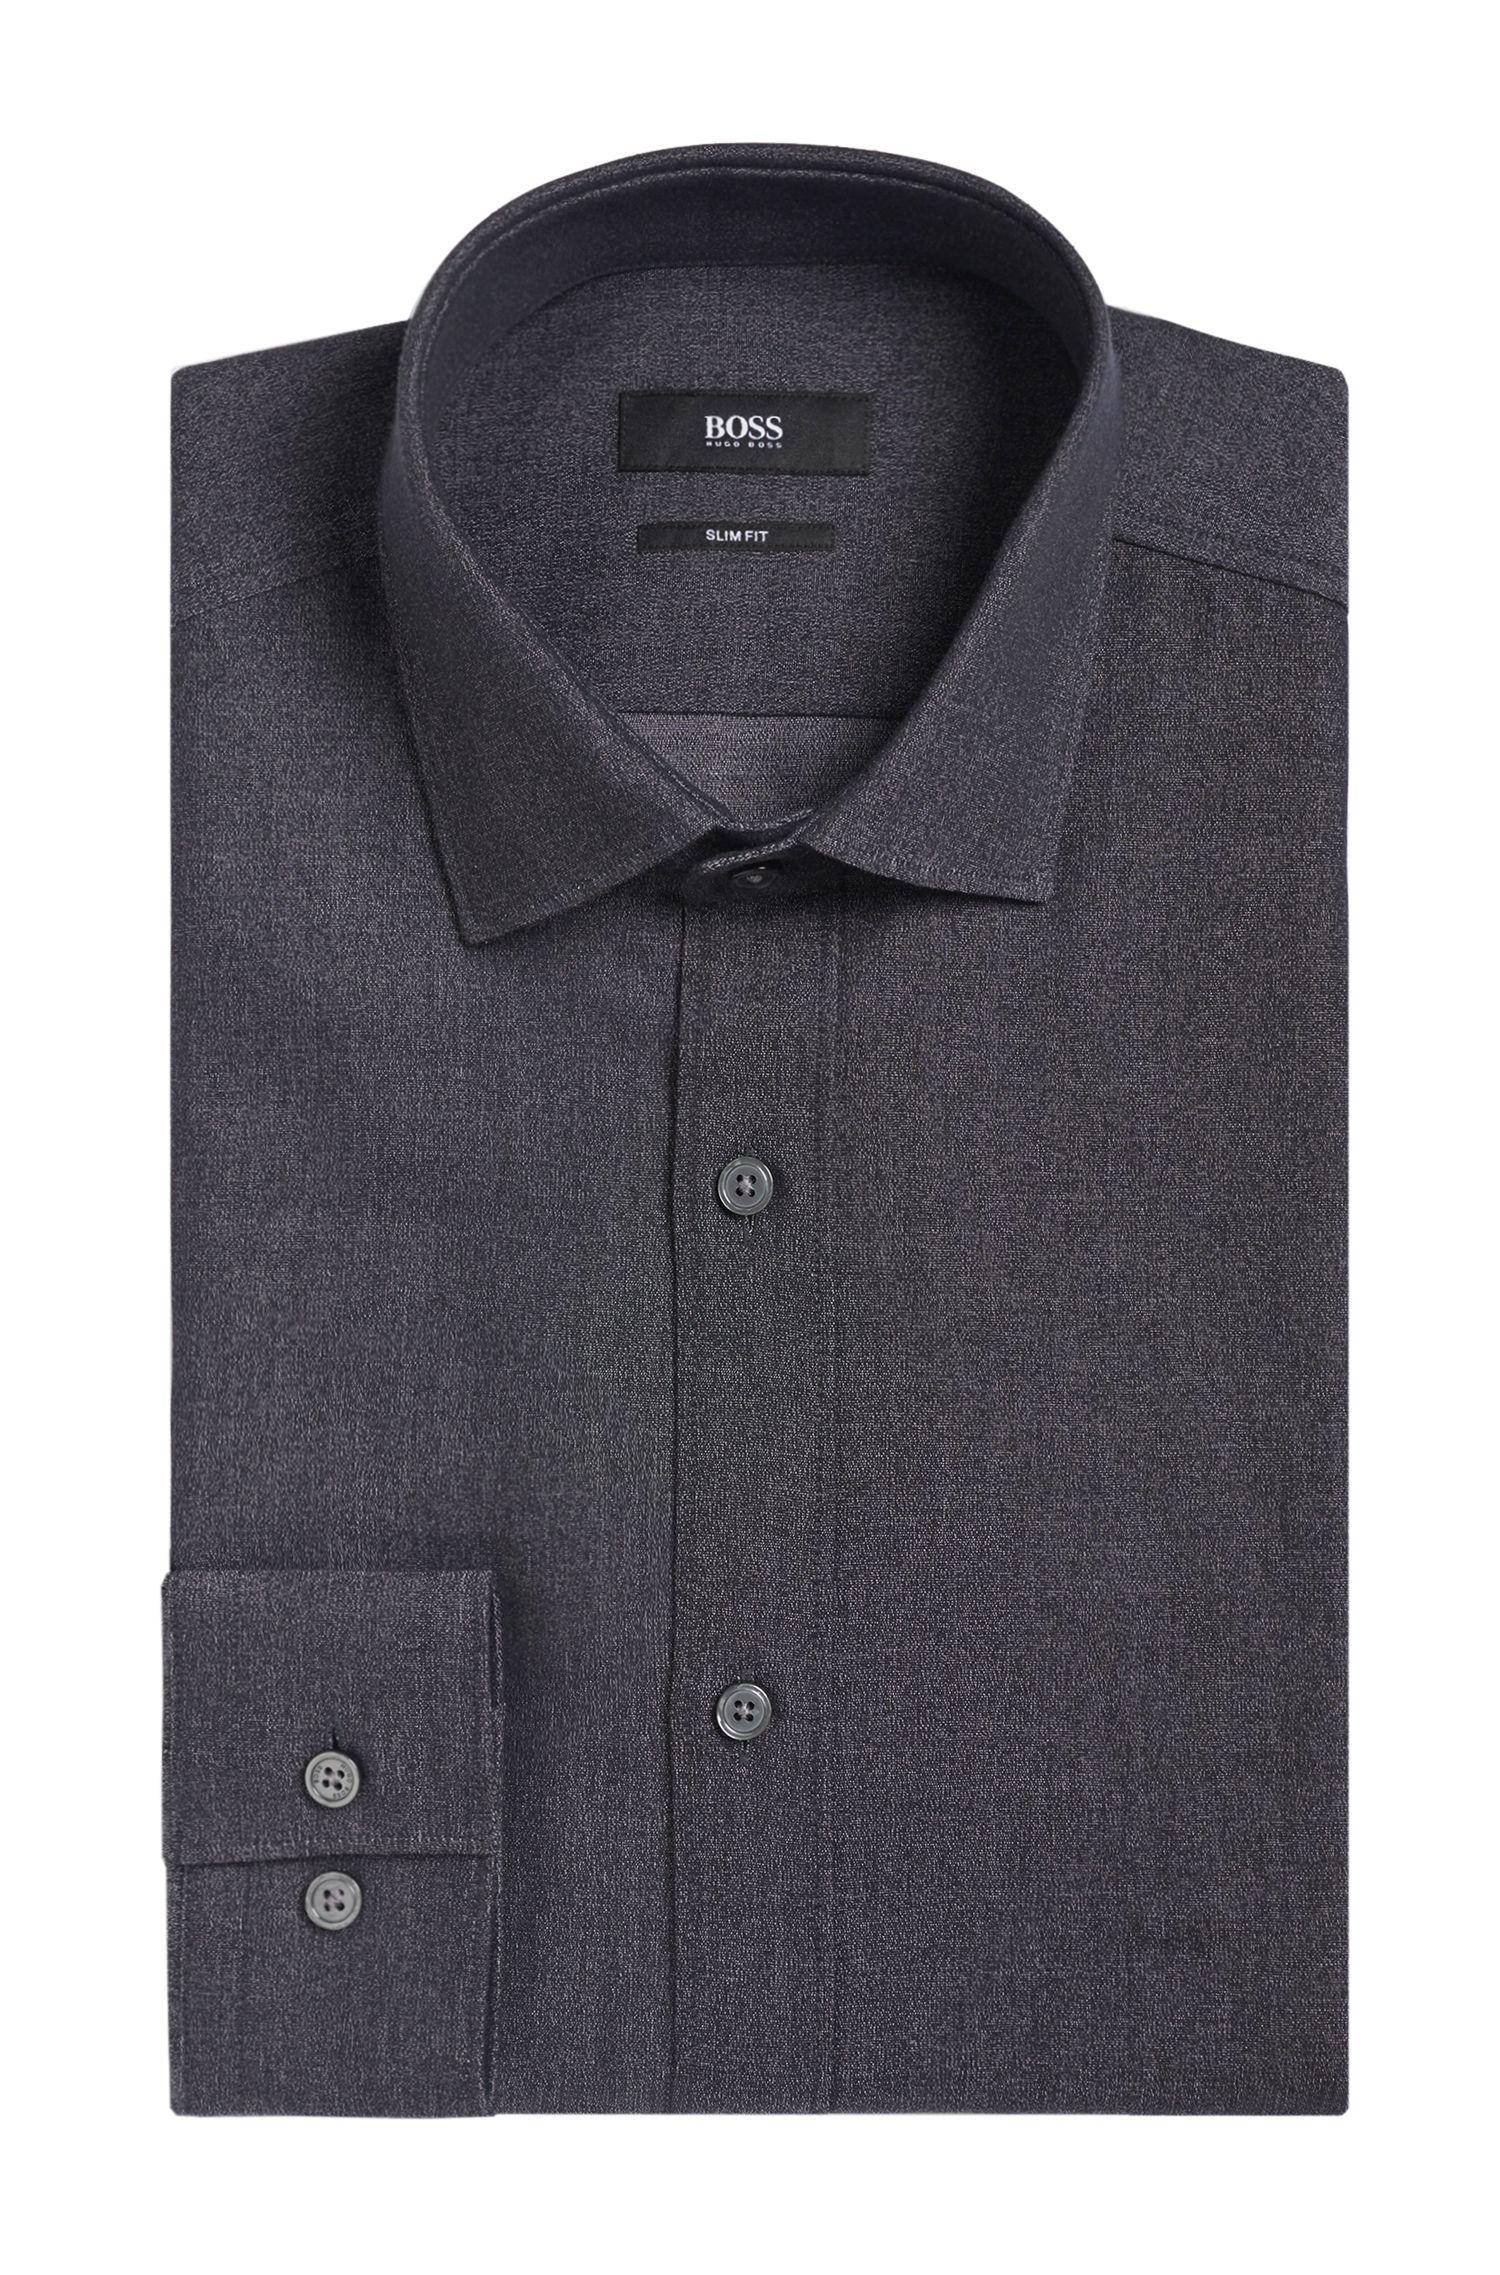 'Isaak'   Slim Fit, Cotton Dress Shirt